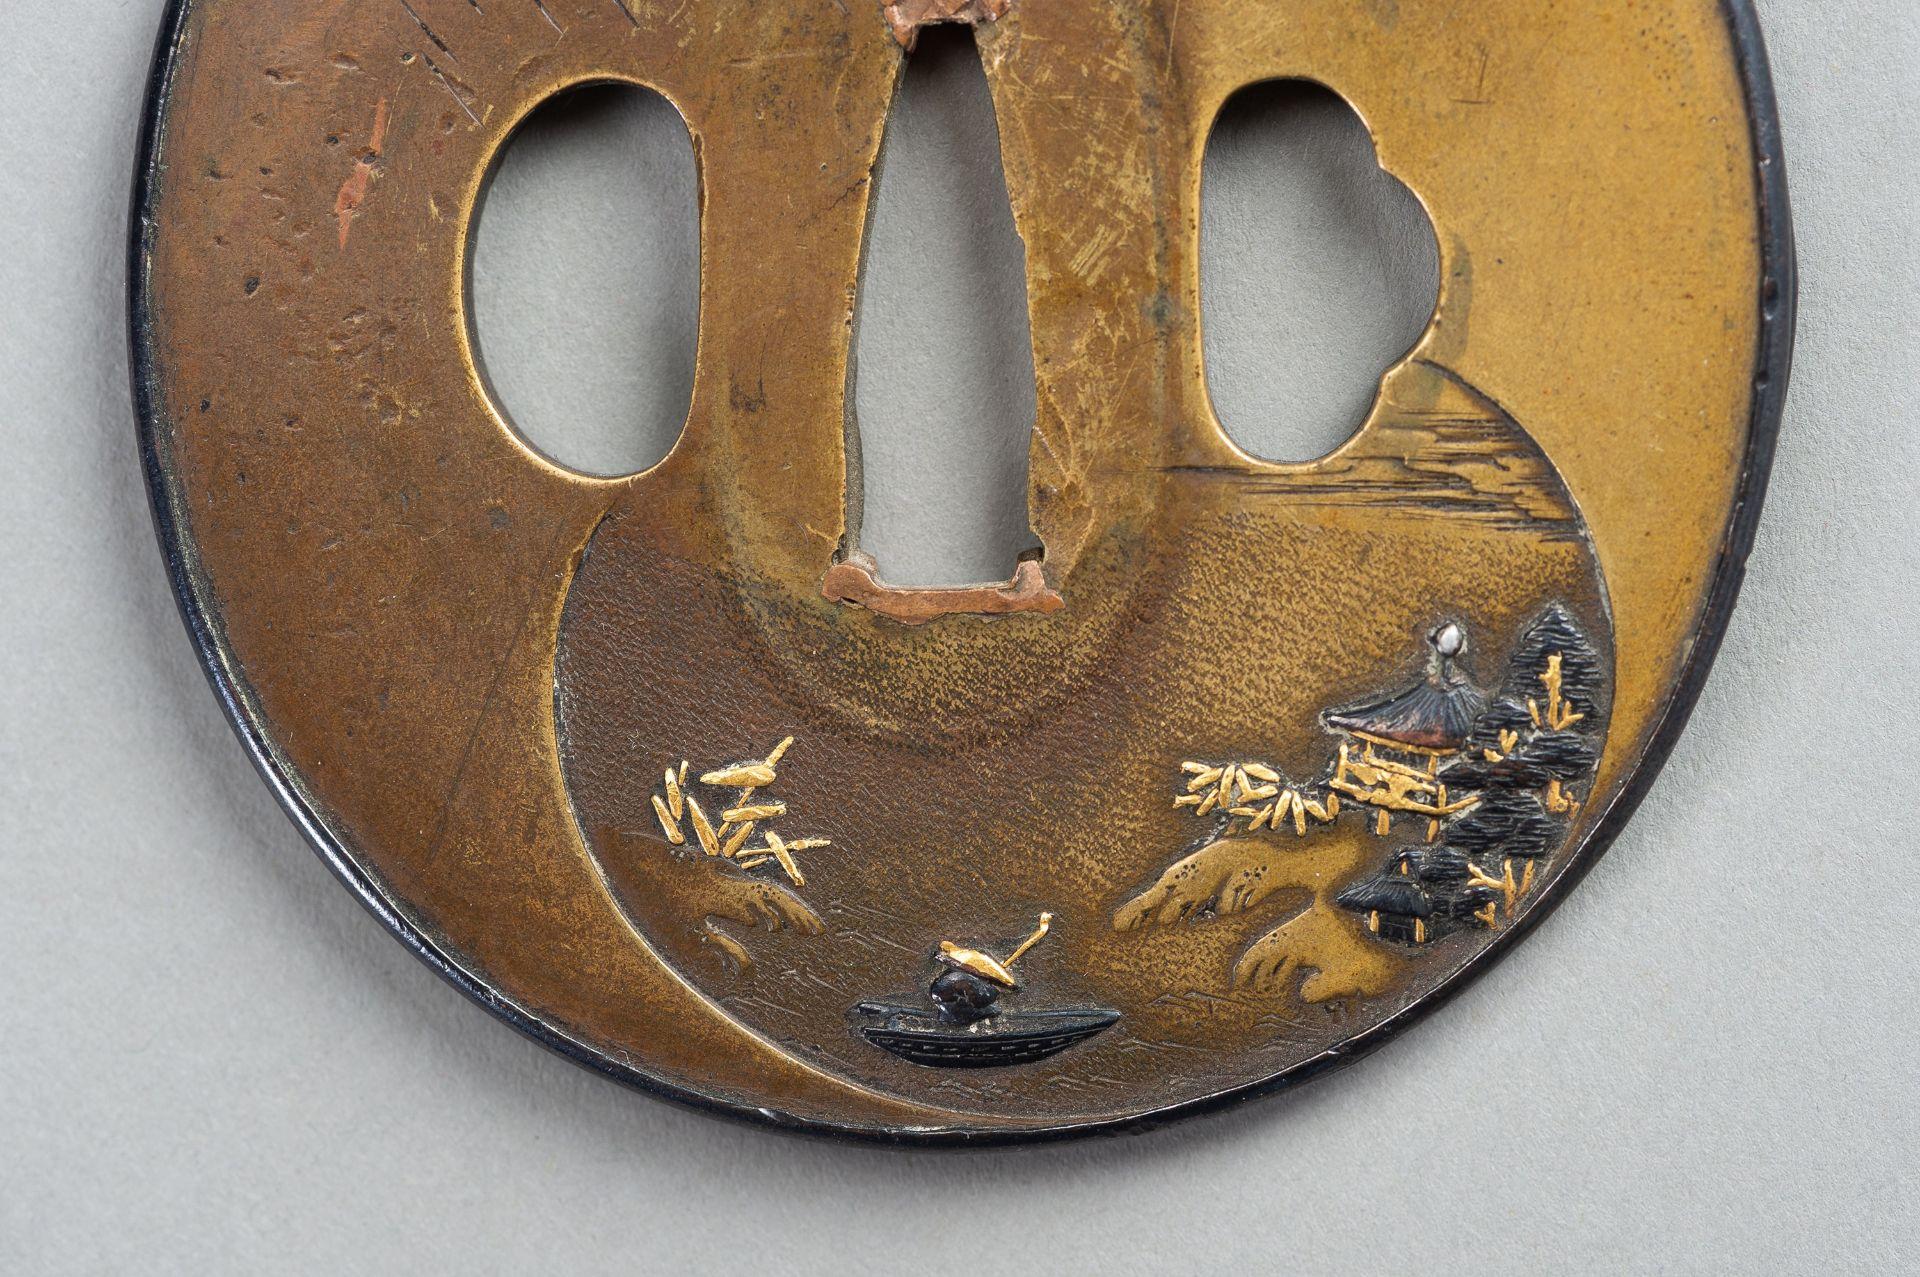 A SENTOKU TSUBA WITH A LANDSCAPE - Image 5 of 5